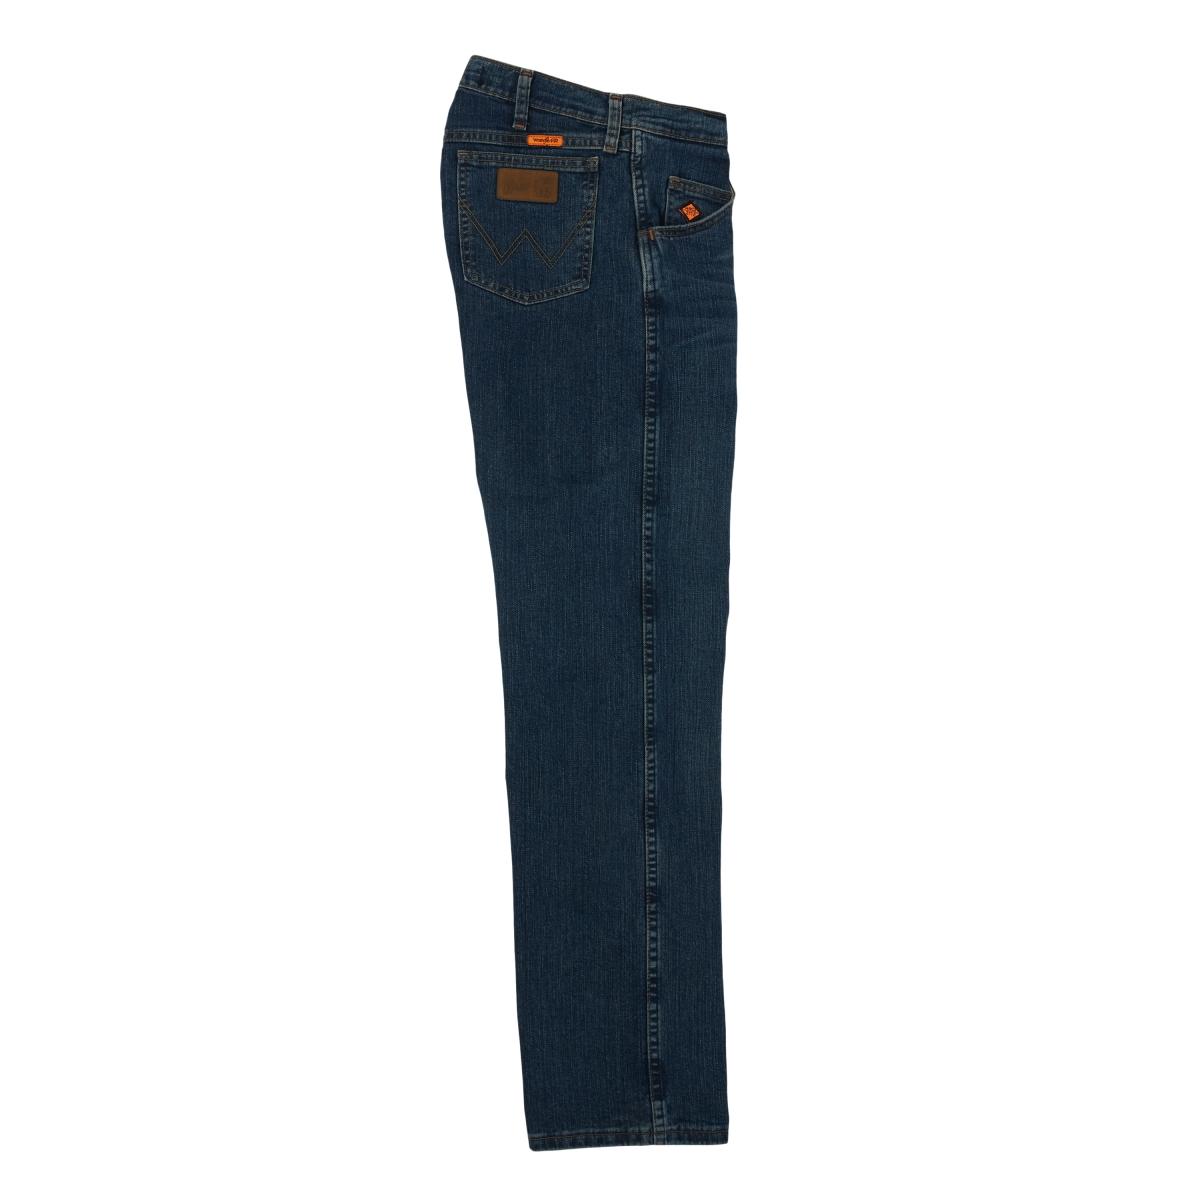 Wrangler® FR Advanced Comfort Regular Fit Jean